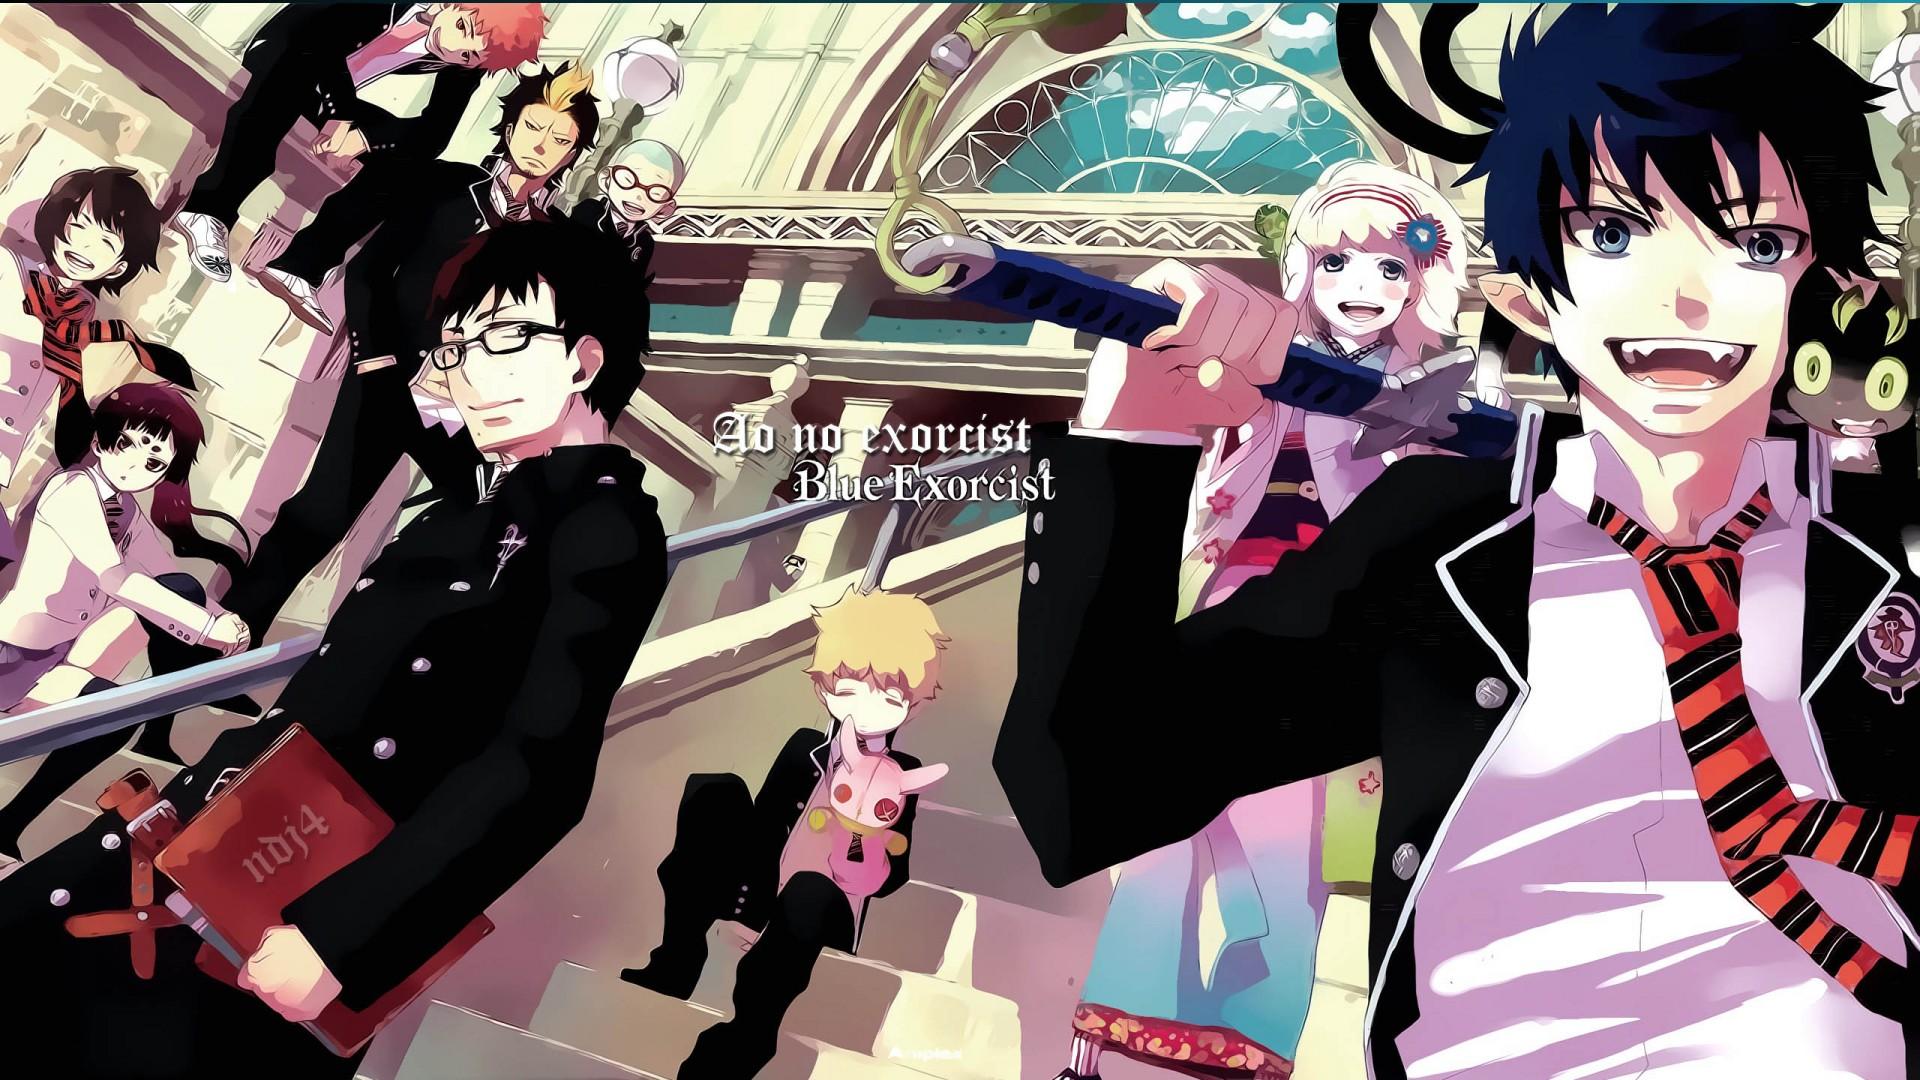 Ao-No-Exorcist-Anime-Image-wallpaper-wp3402529